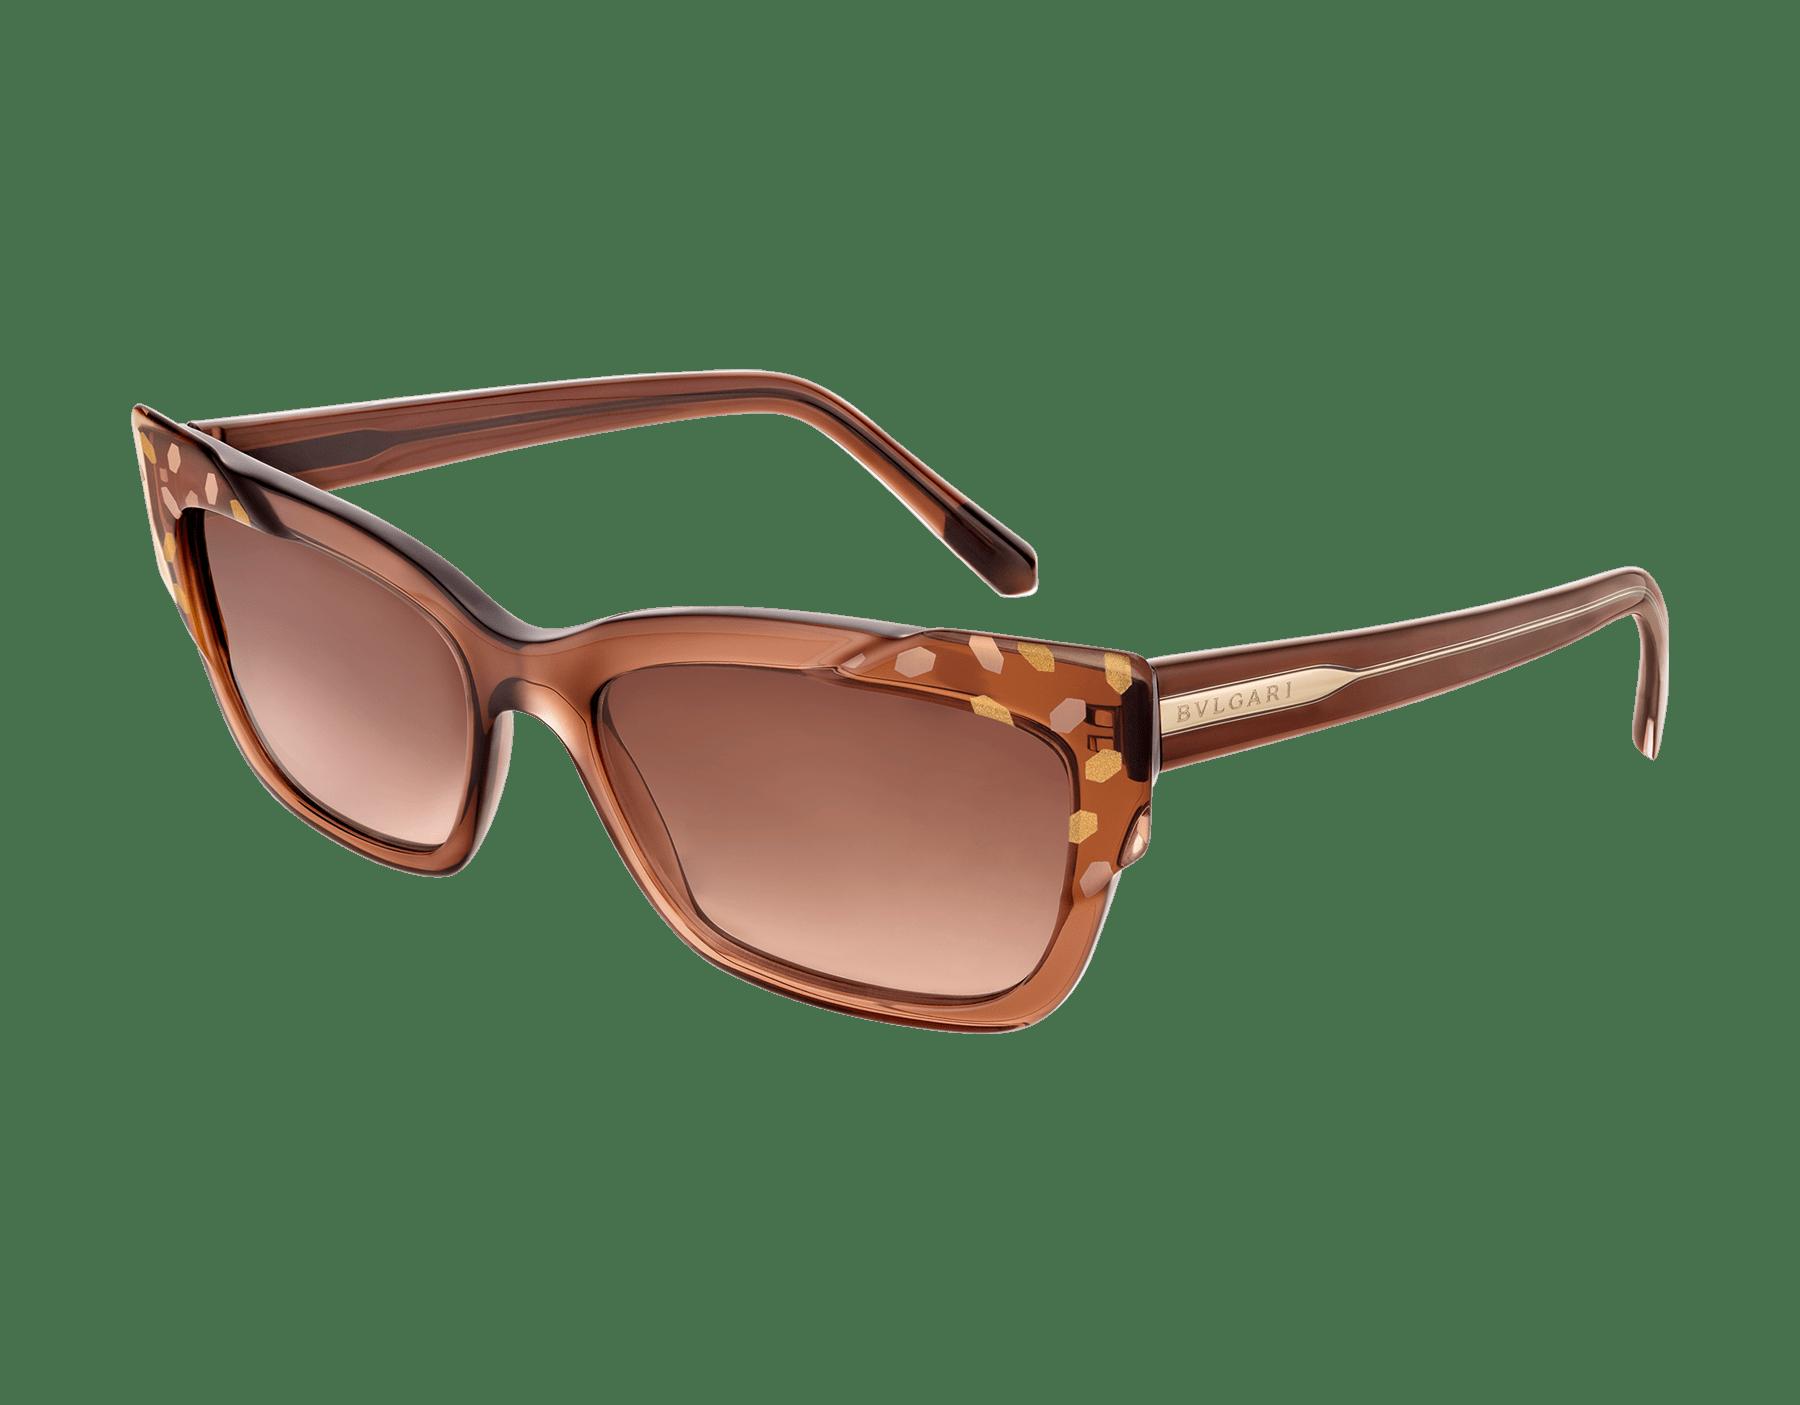 Bvlgari Serpenti Scale-blast rectangular cat-eye acetate sunglasses. 903736 image 1